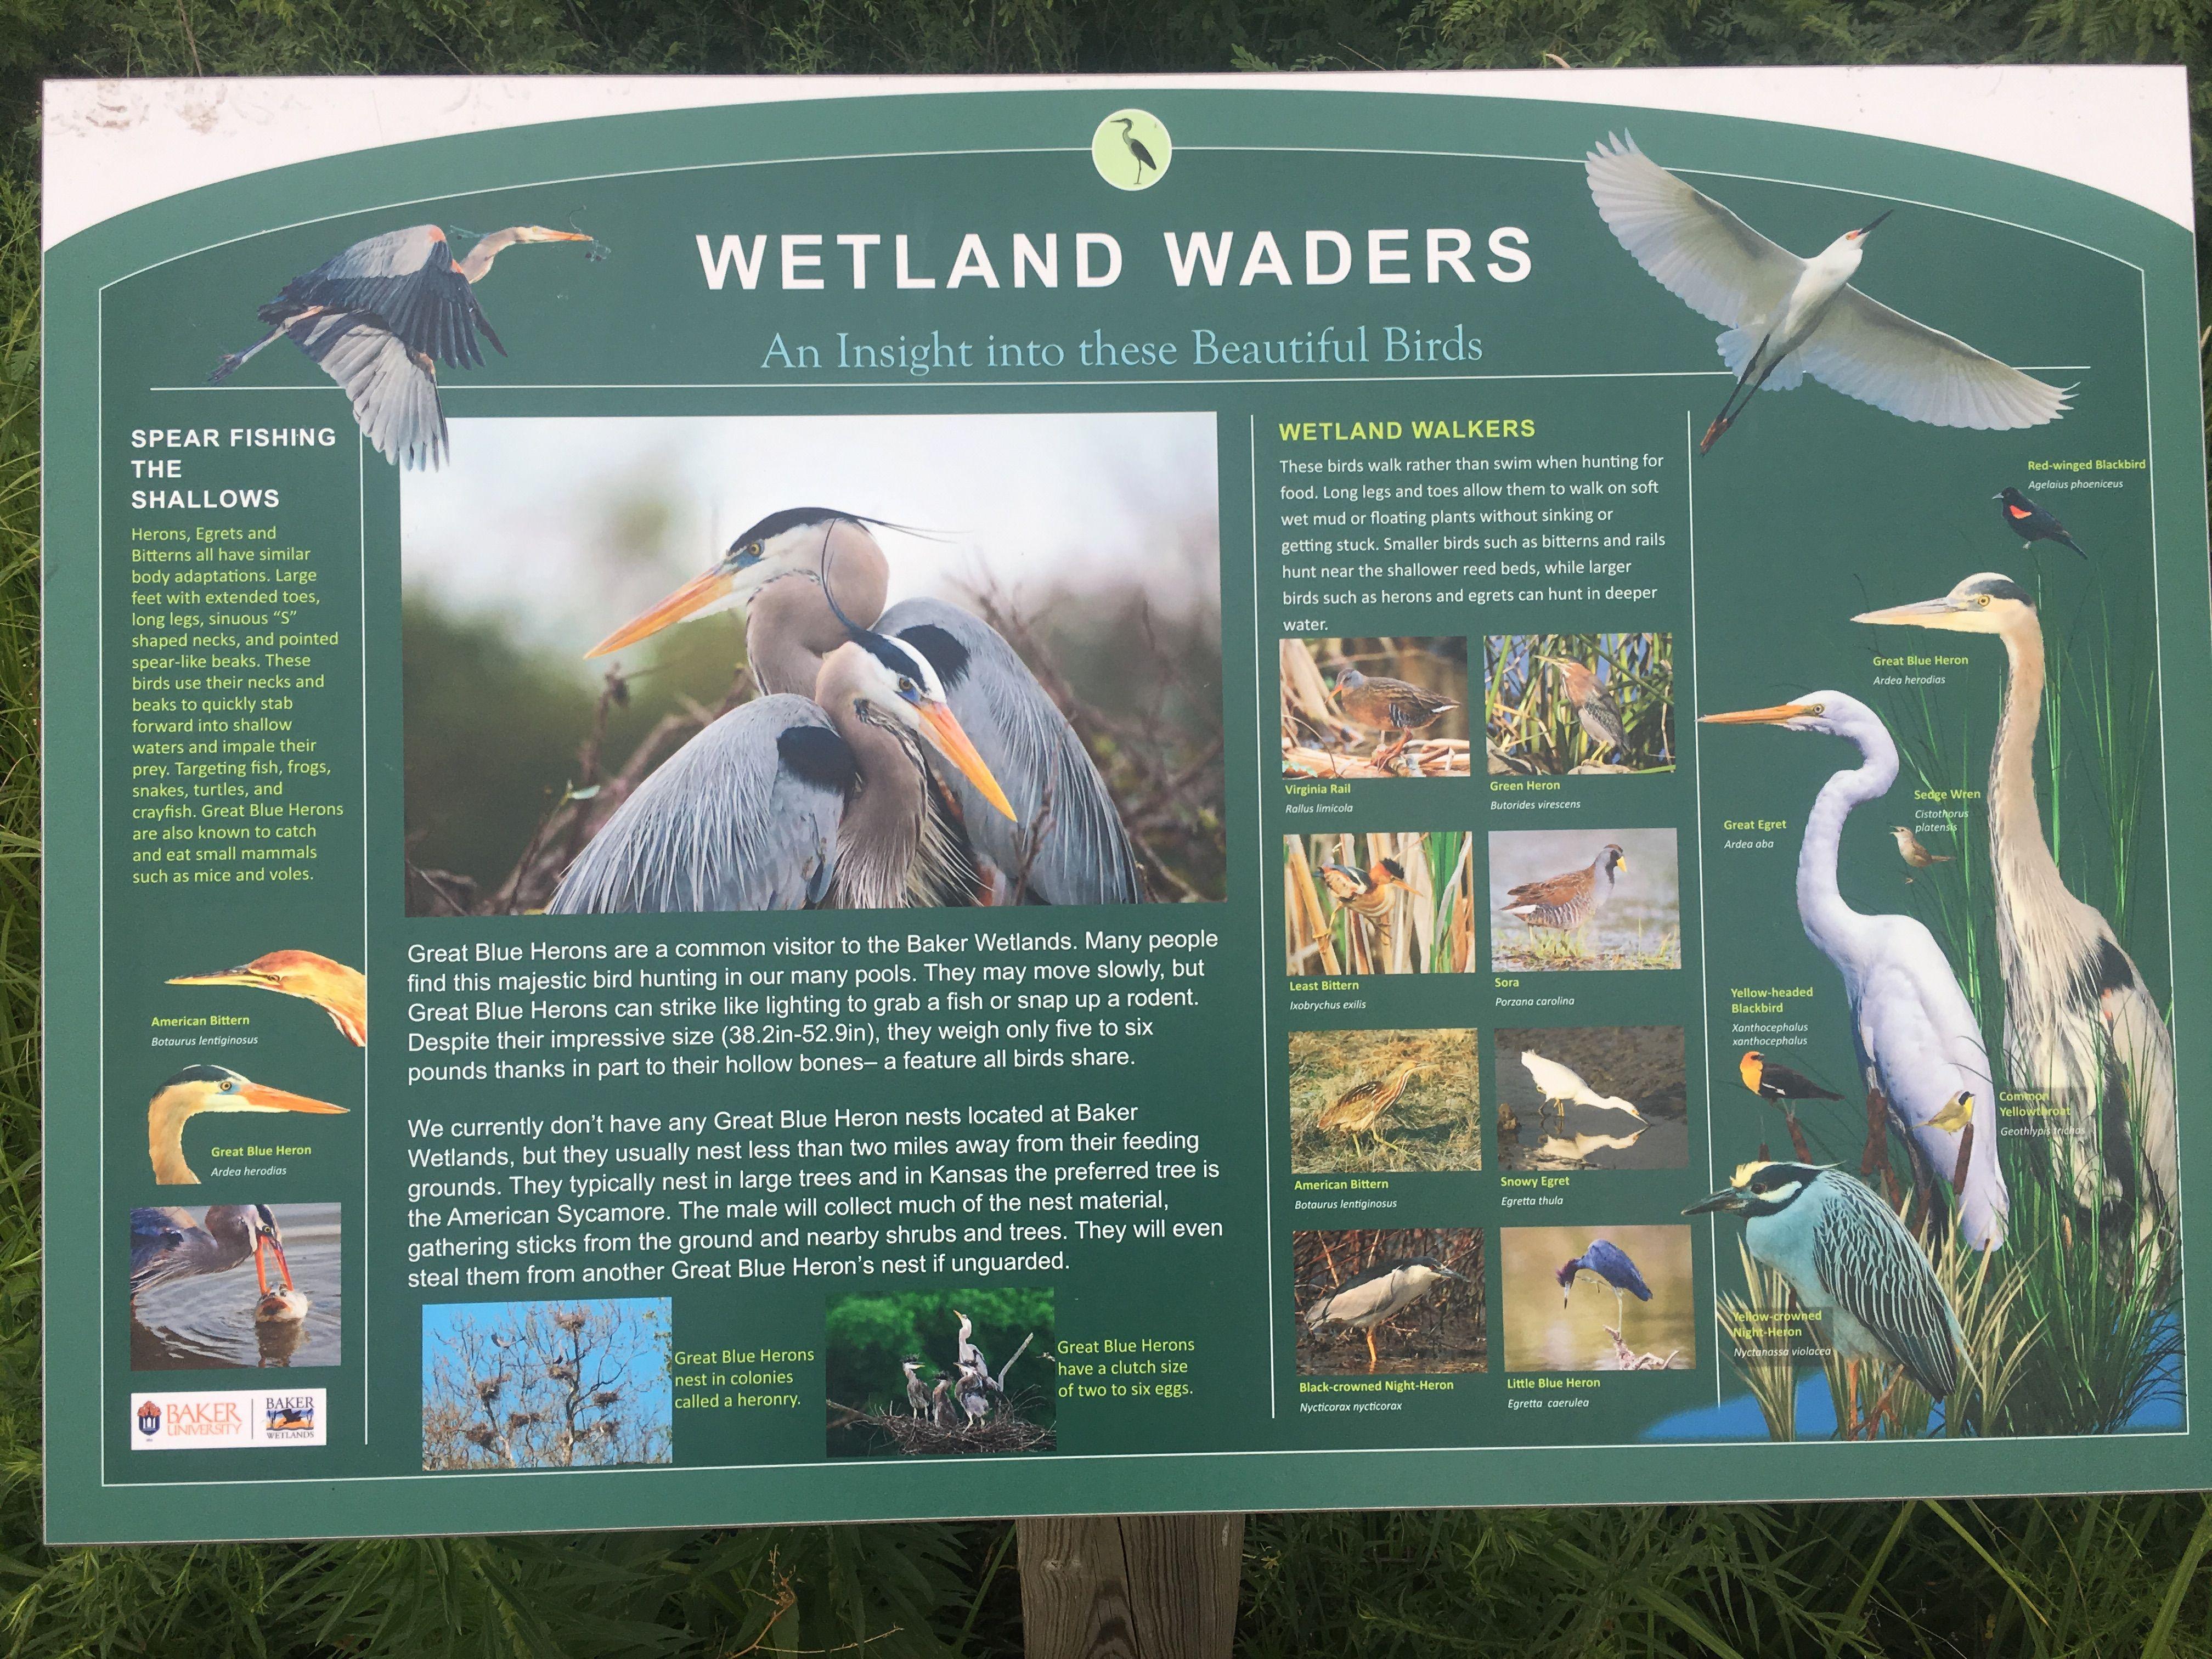 Wetland Waders Wetland, Beautiful birds, All birds